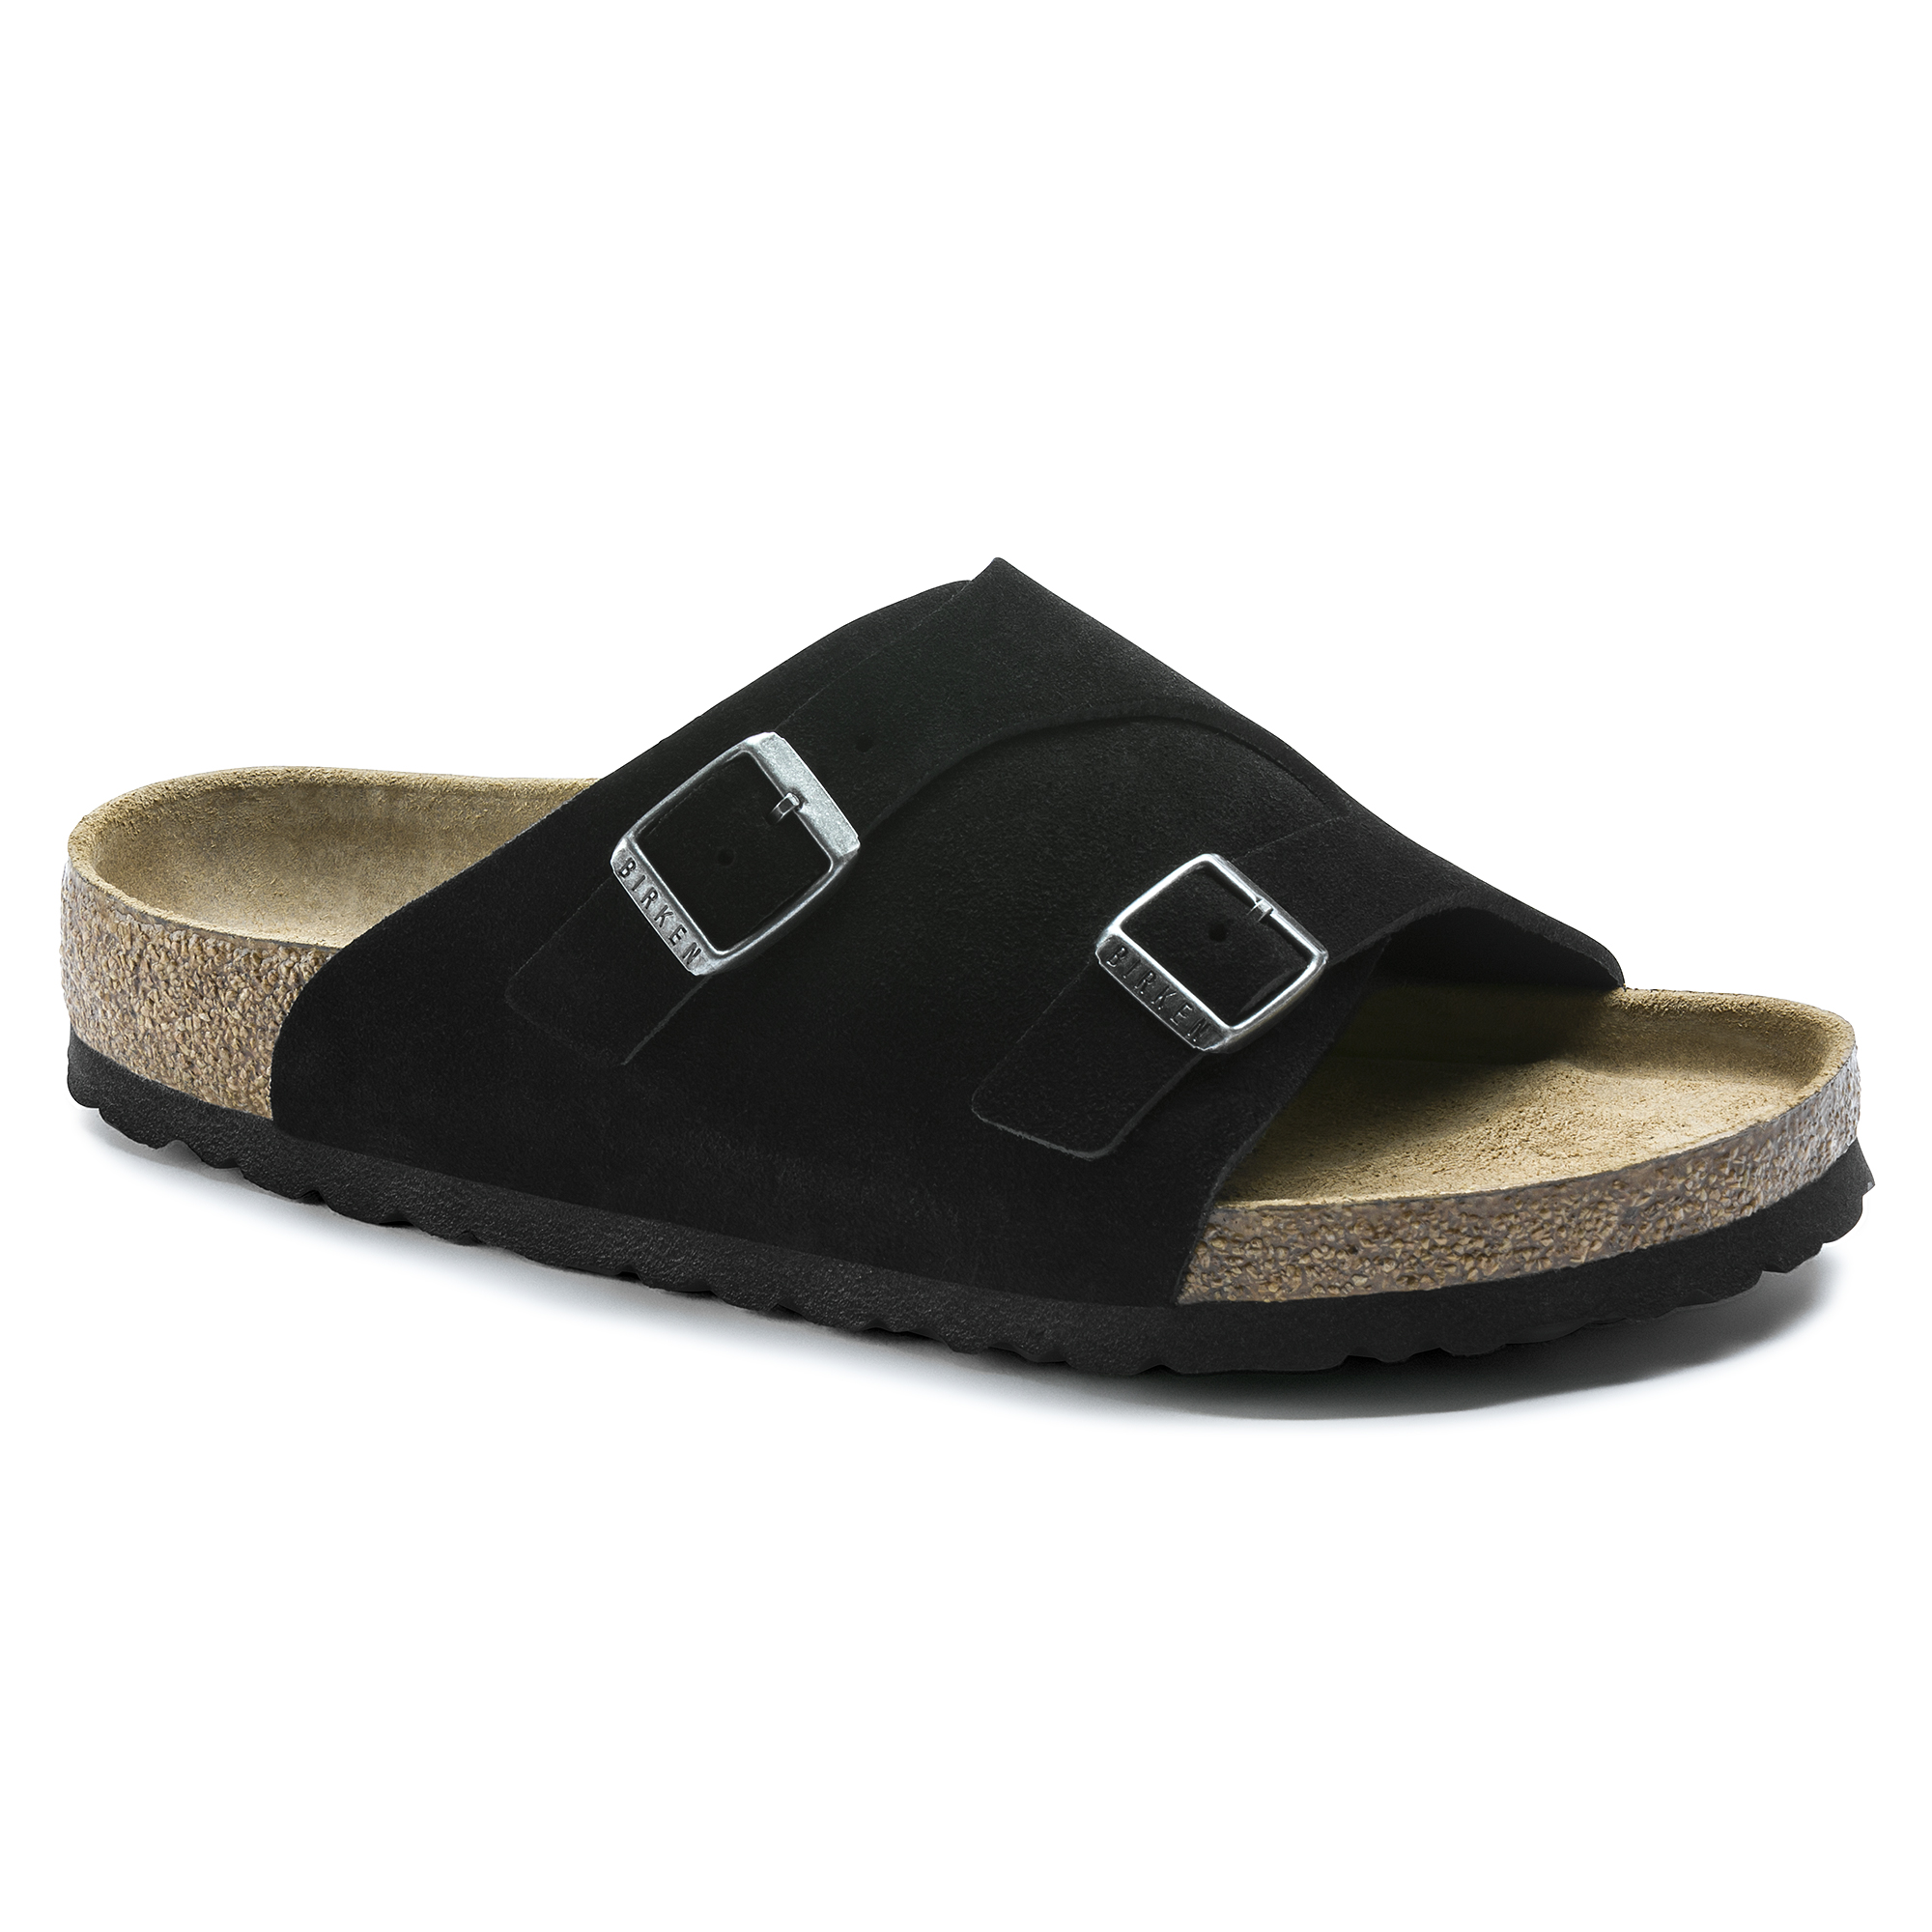 Zürich Suede Leather Soft Footbed Black